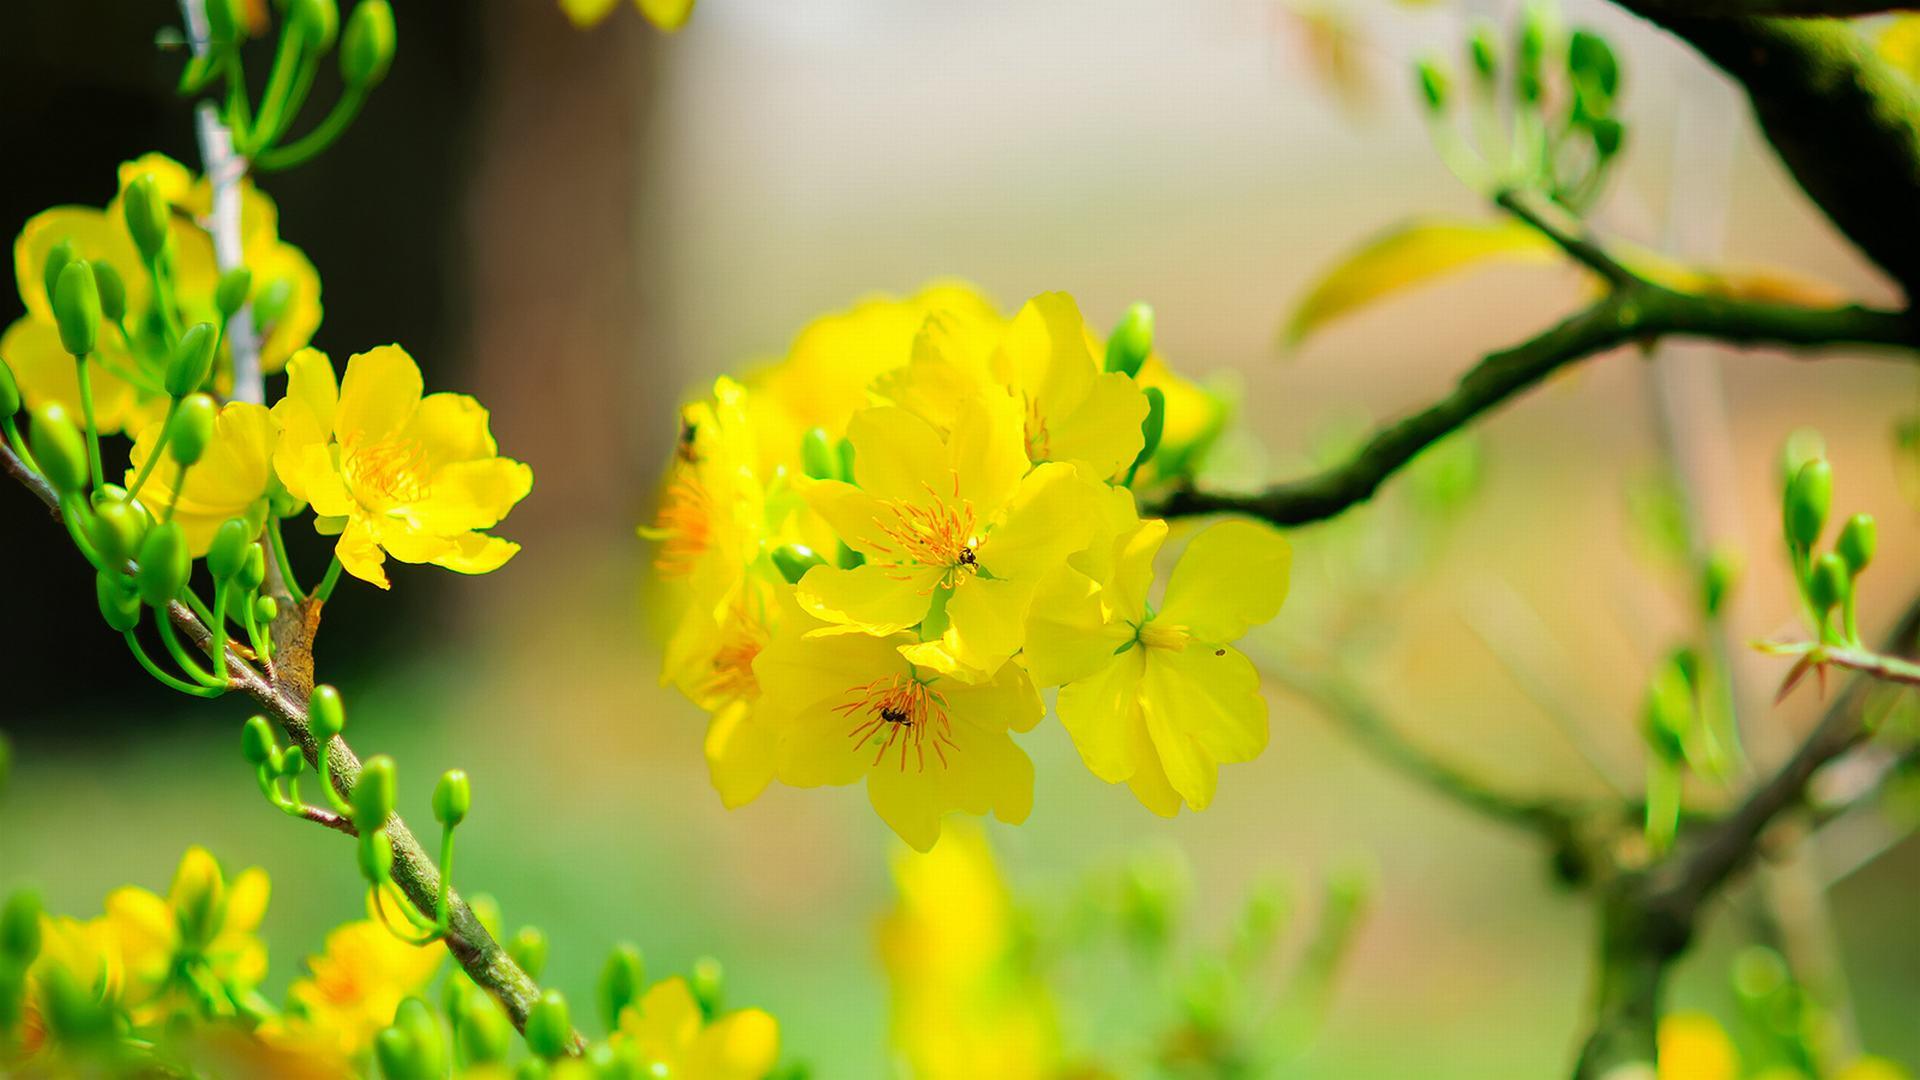 ảnh hoa mai đẹp nhất